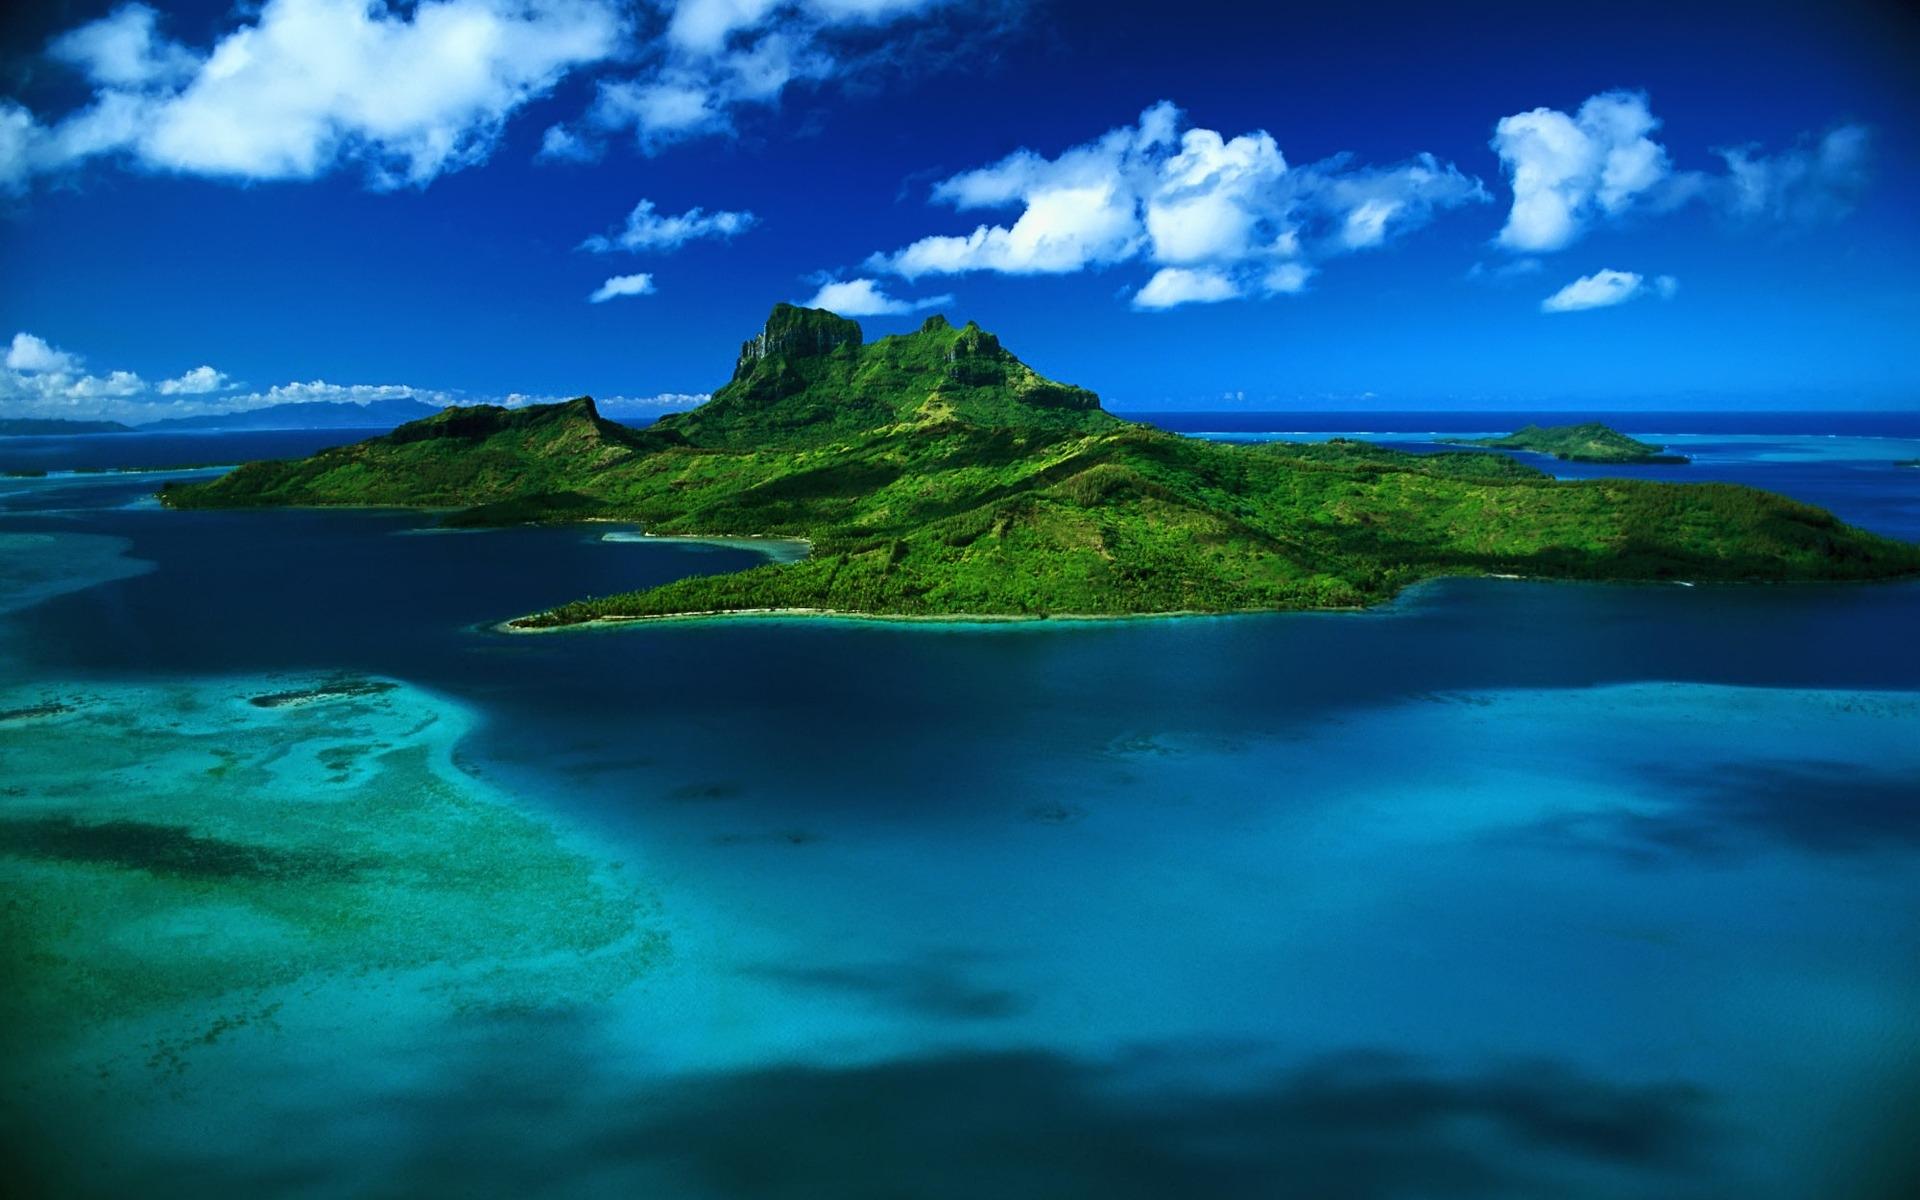 Tropical island 1920 x 1200 Nature Photography MIRIADNACOM 1920x1200